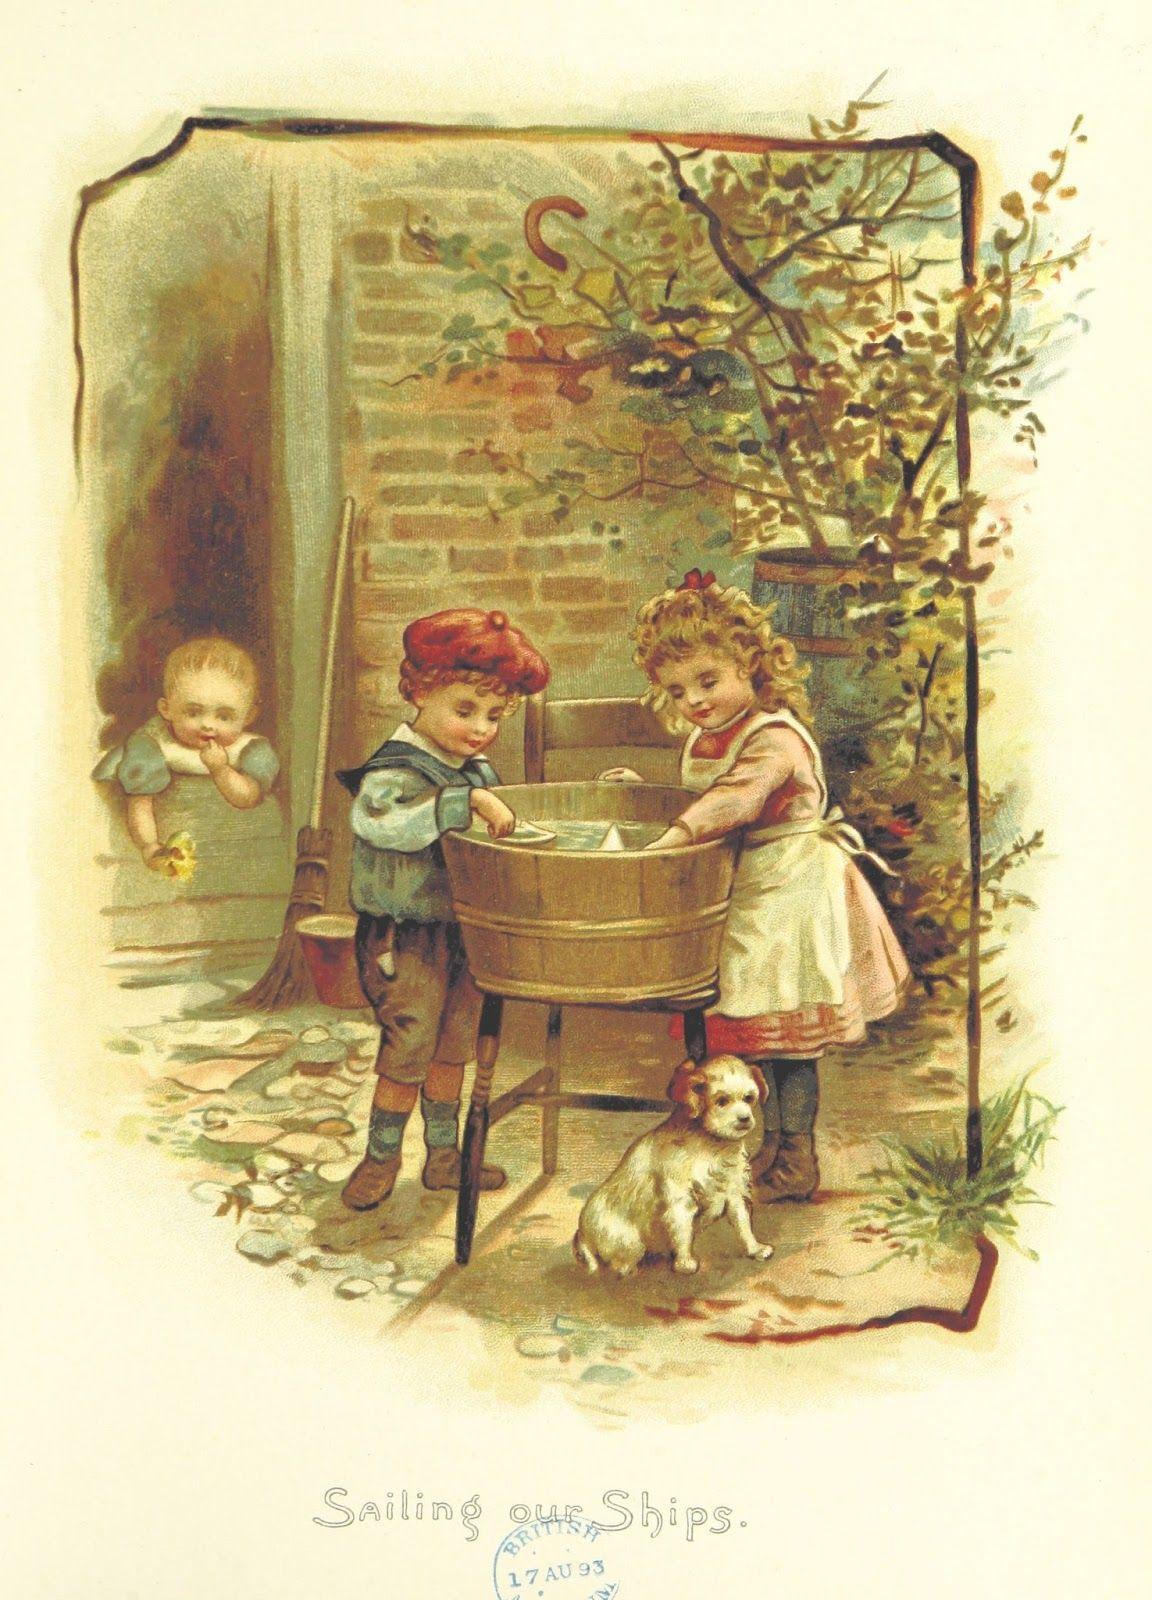 Alenquerensis Helen Jackson' Illustrations 1883